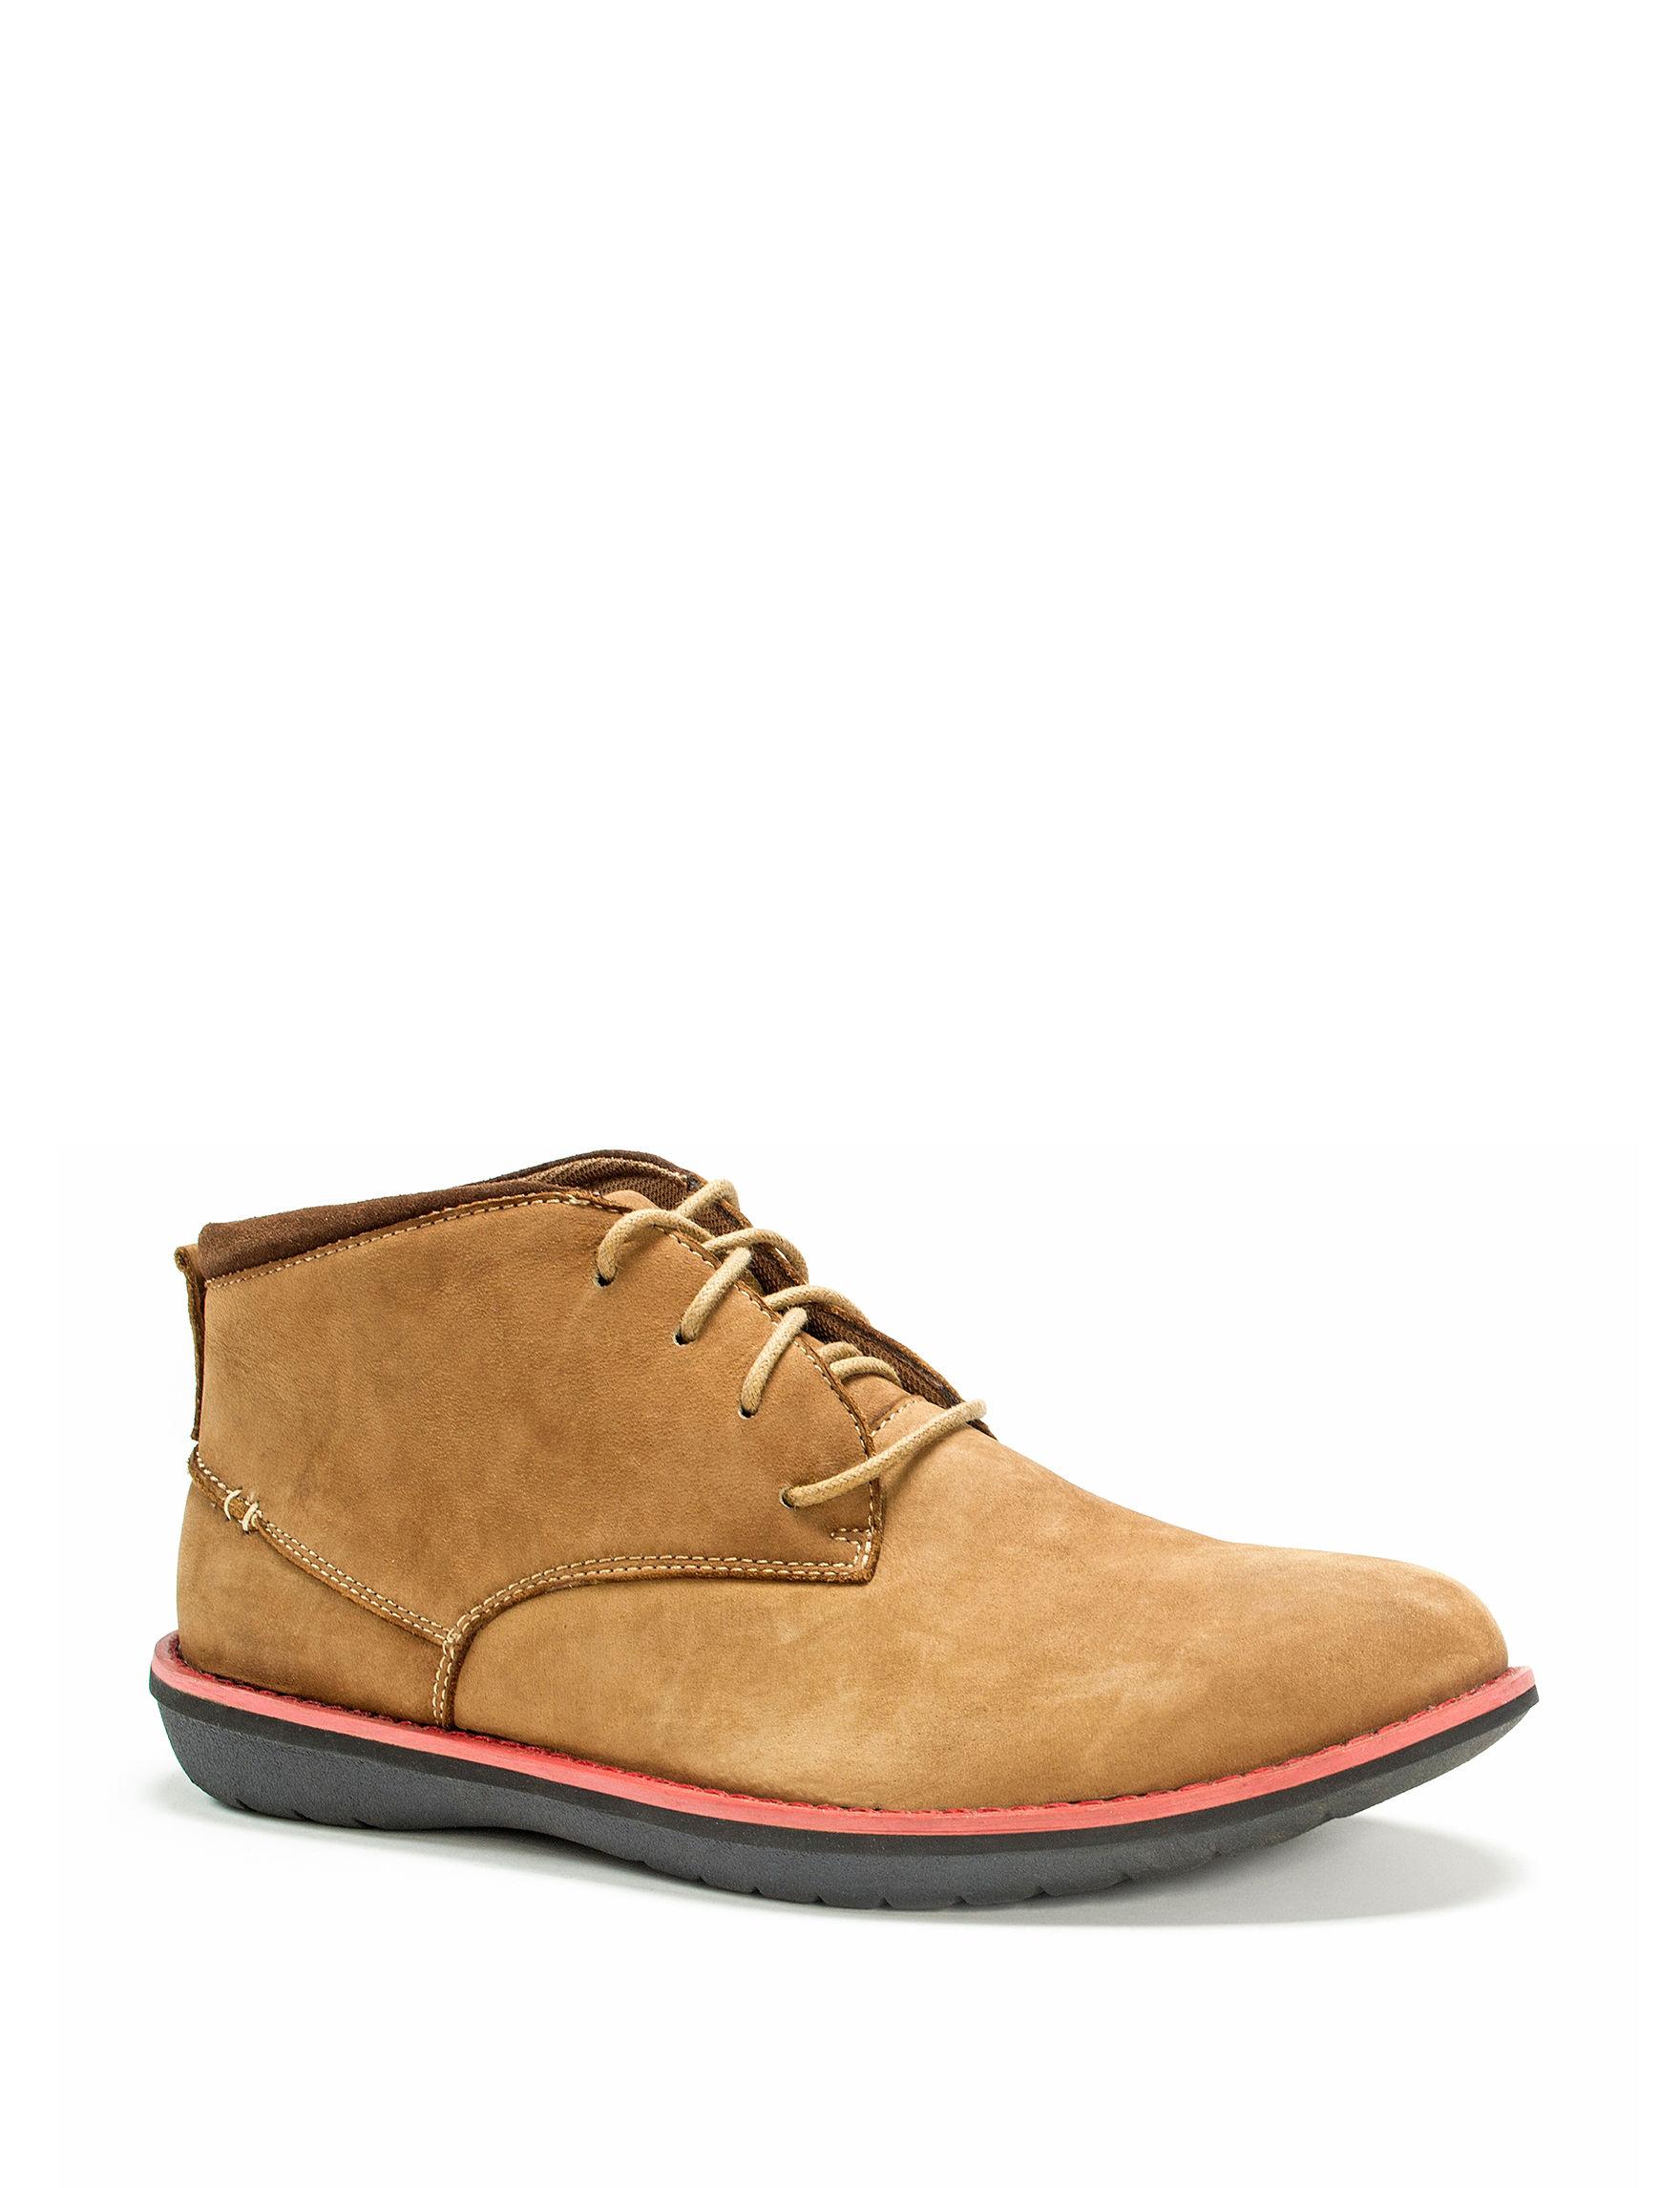 Muk Luks Tan Chukka Boots